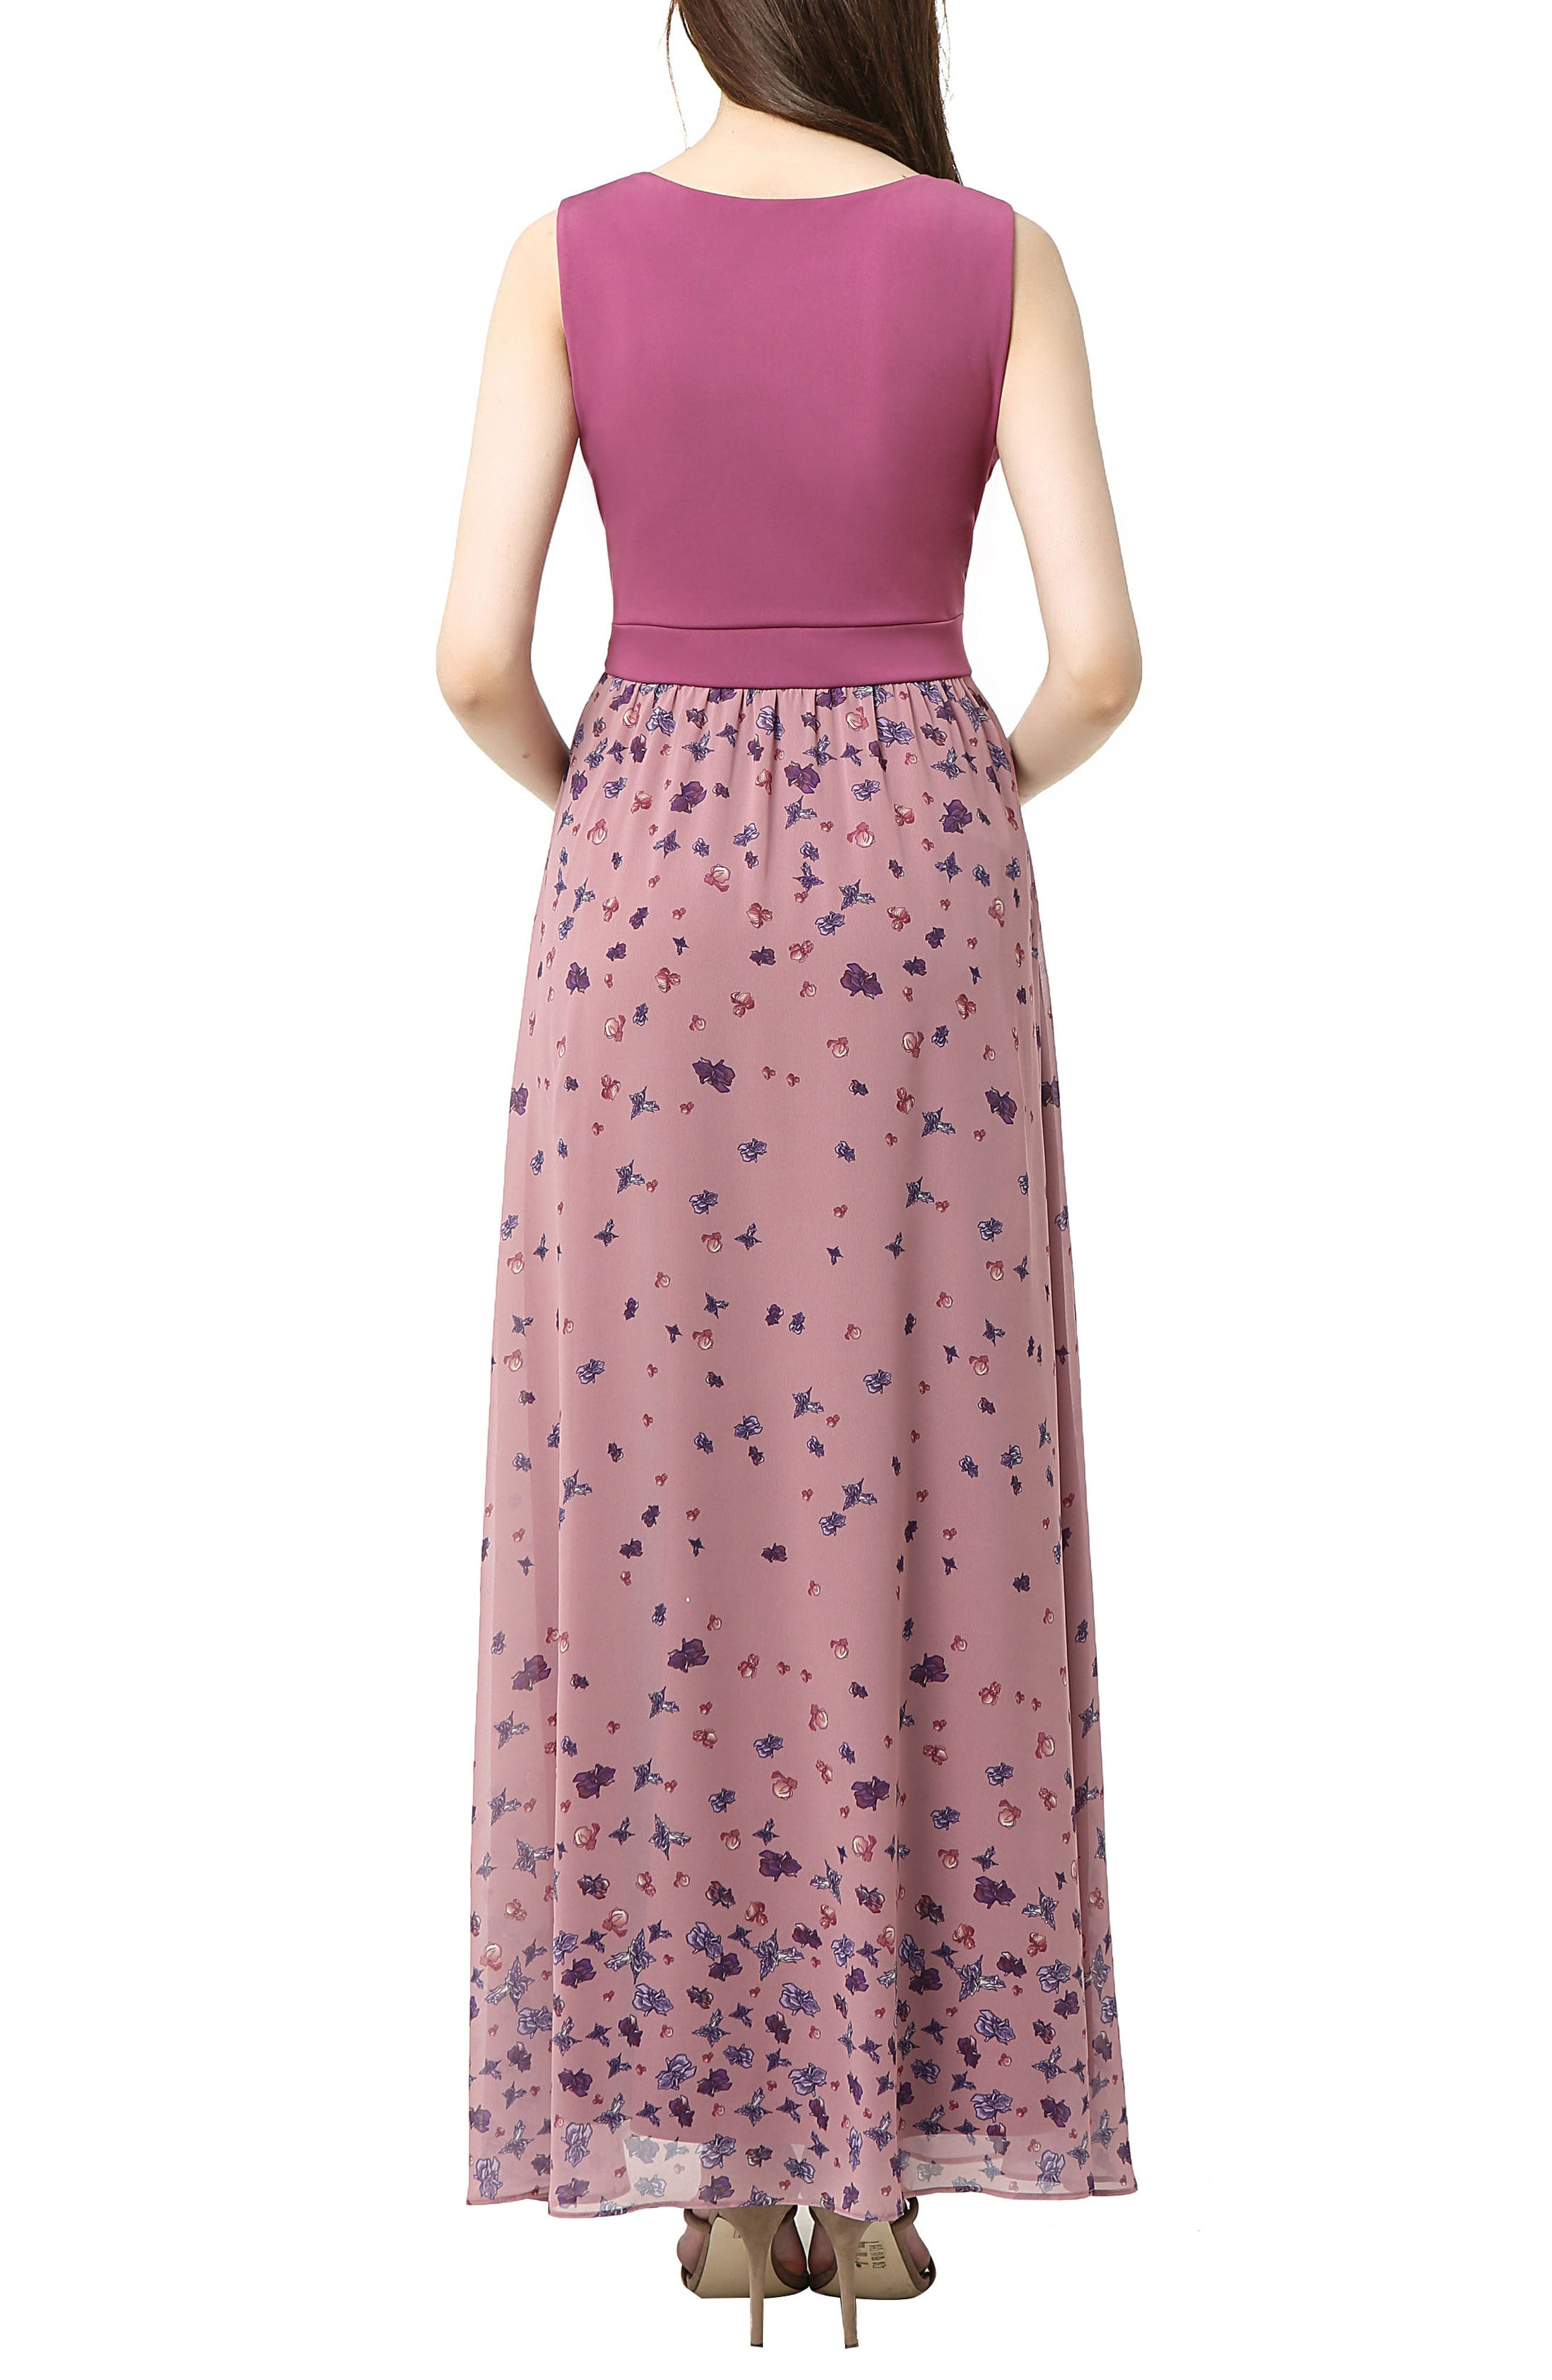 Armanda Maternity Maxi Dress,                             Alternate thumbnail 2, color,                             ROSE PINK